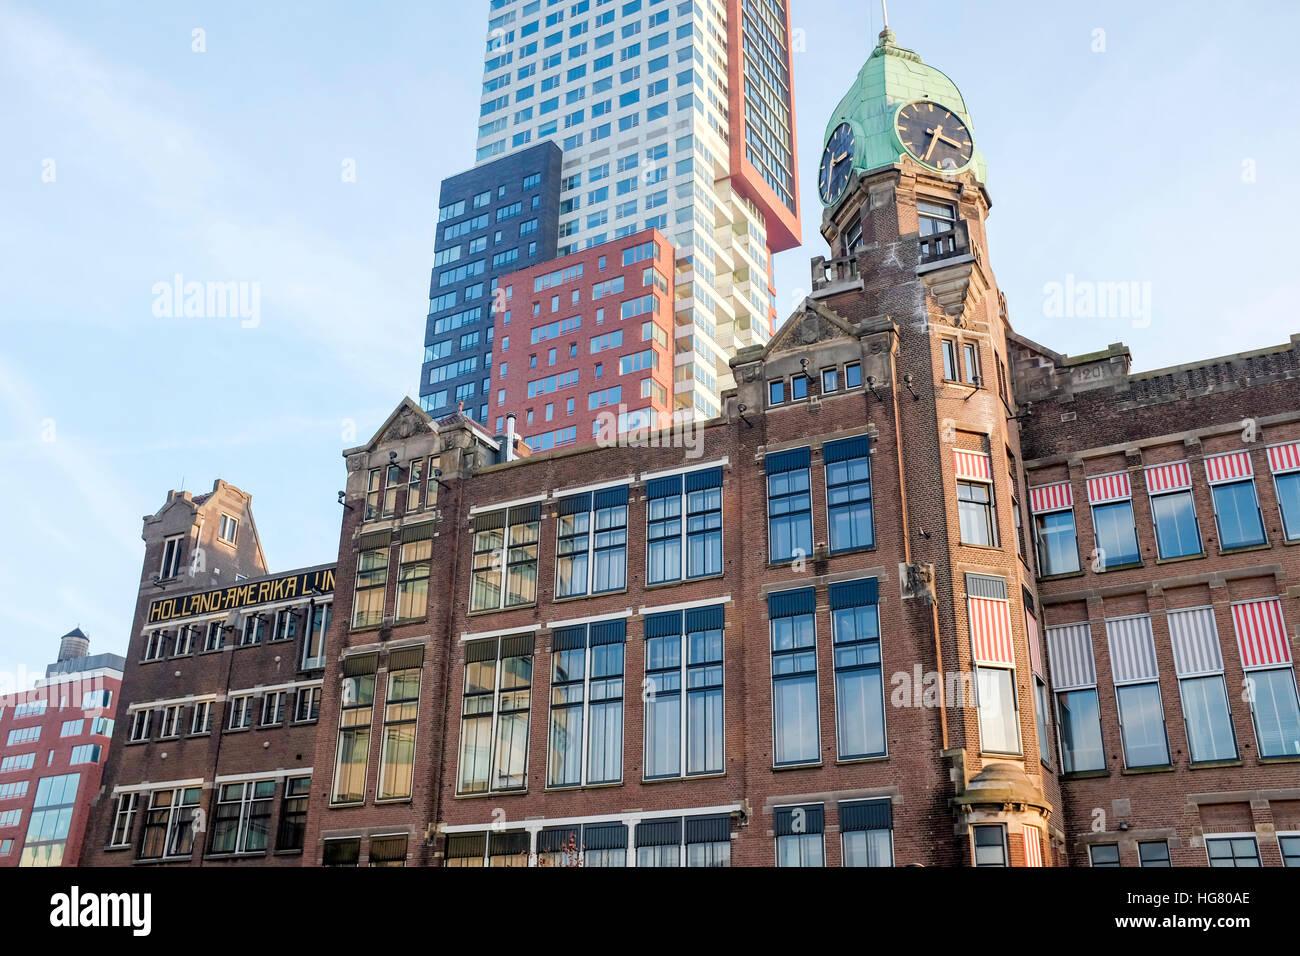 Hotel New York, Holland Amerika Line, Rotterdam, Niederlande Stockbild